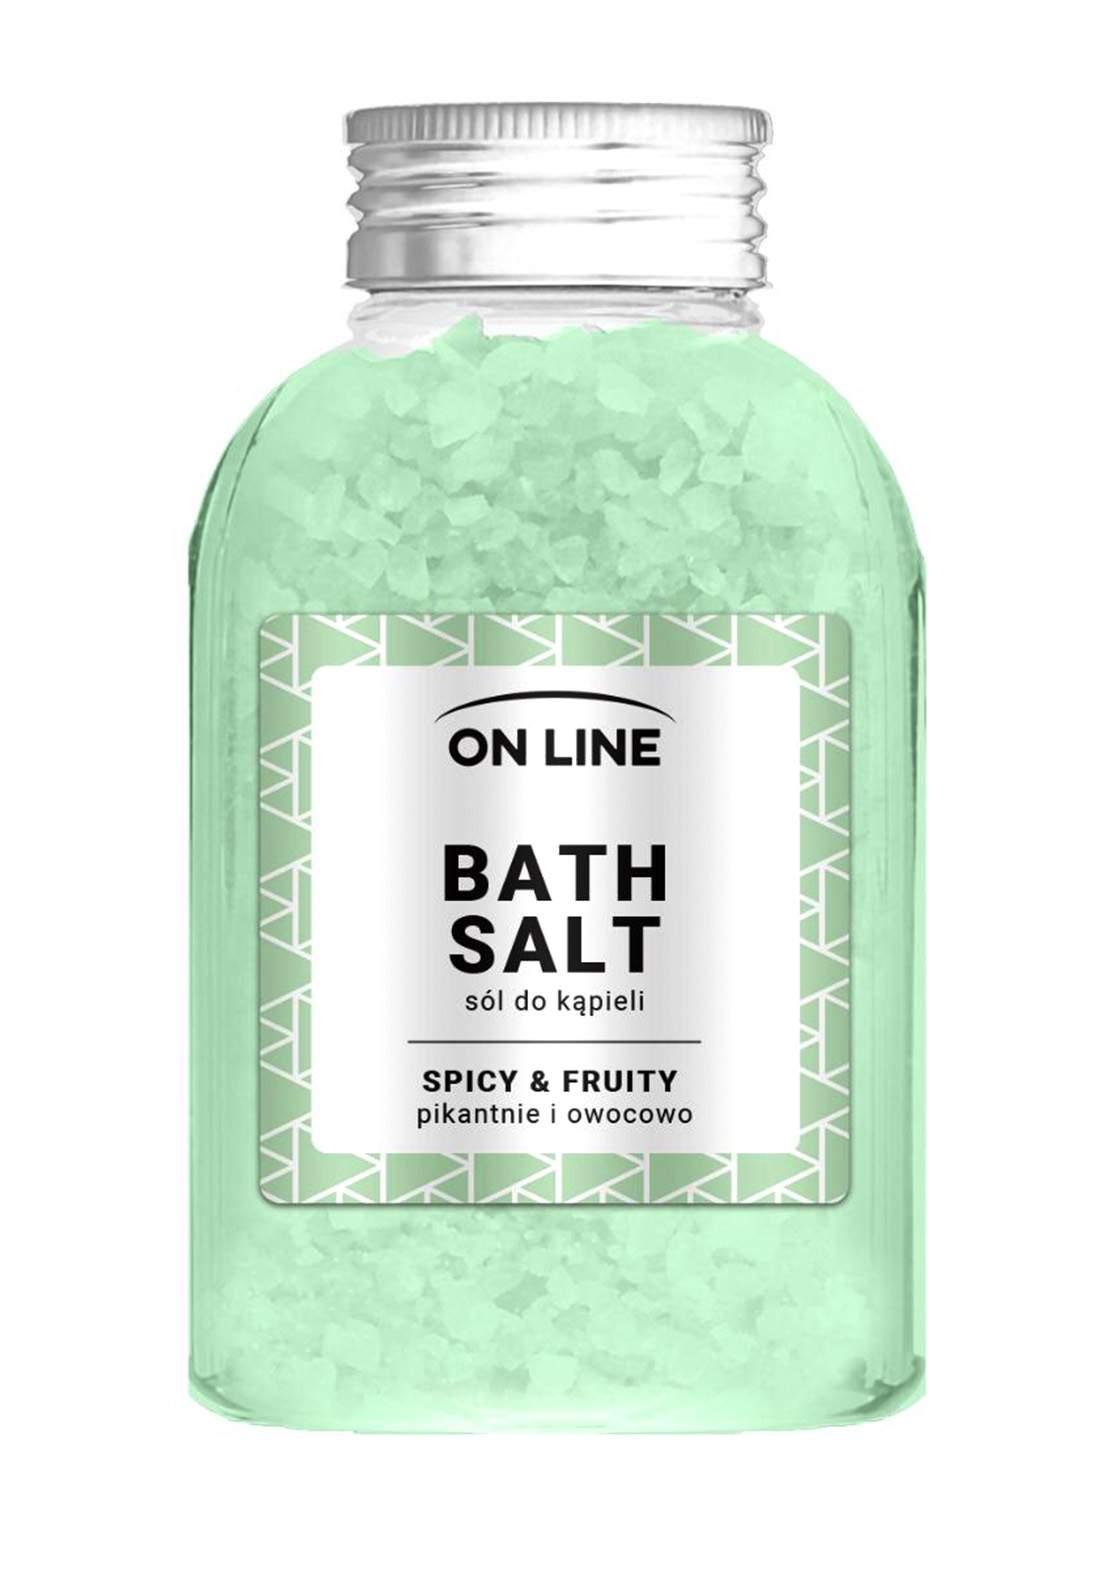 Online Spicy&fruity bath salts 600g املاح العناية بالجسم